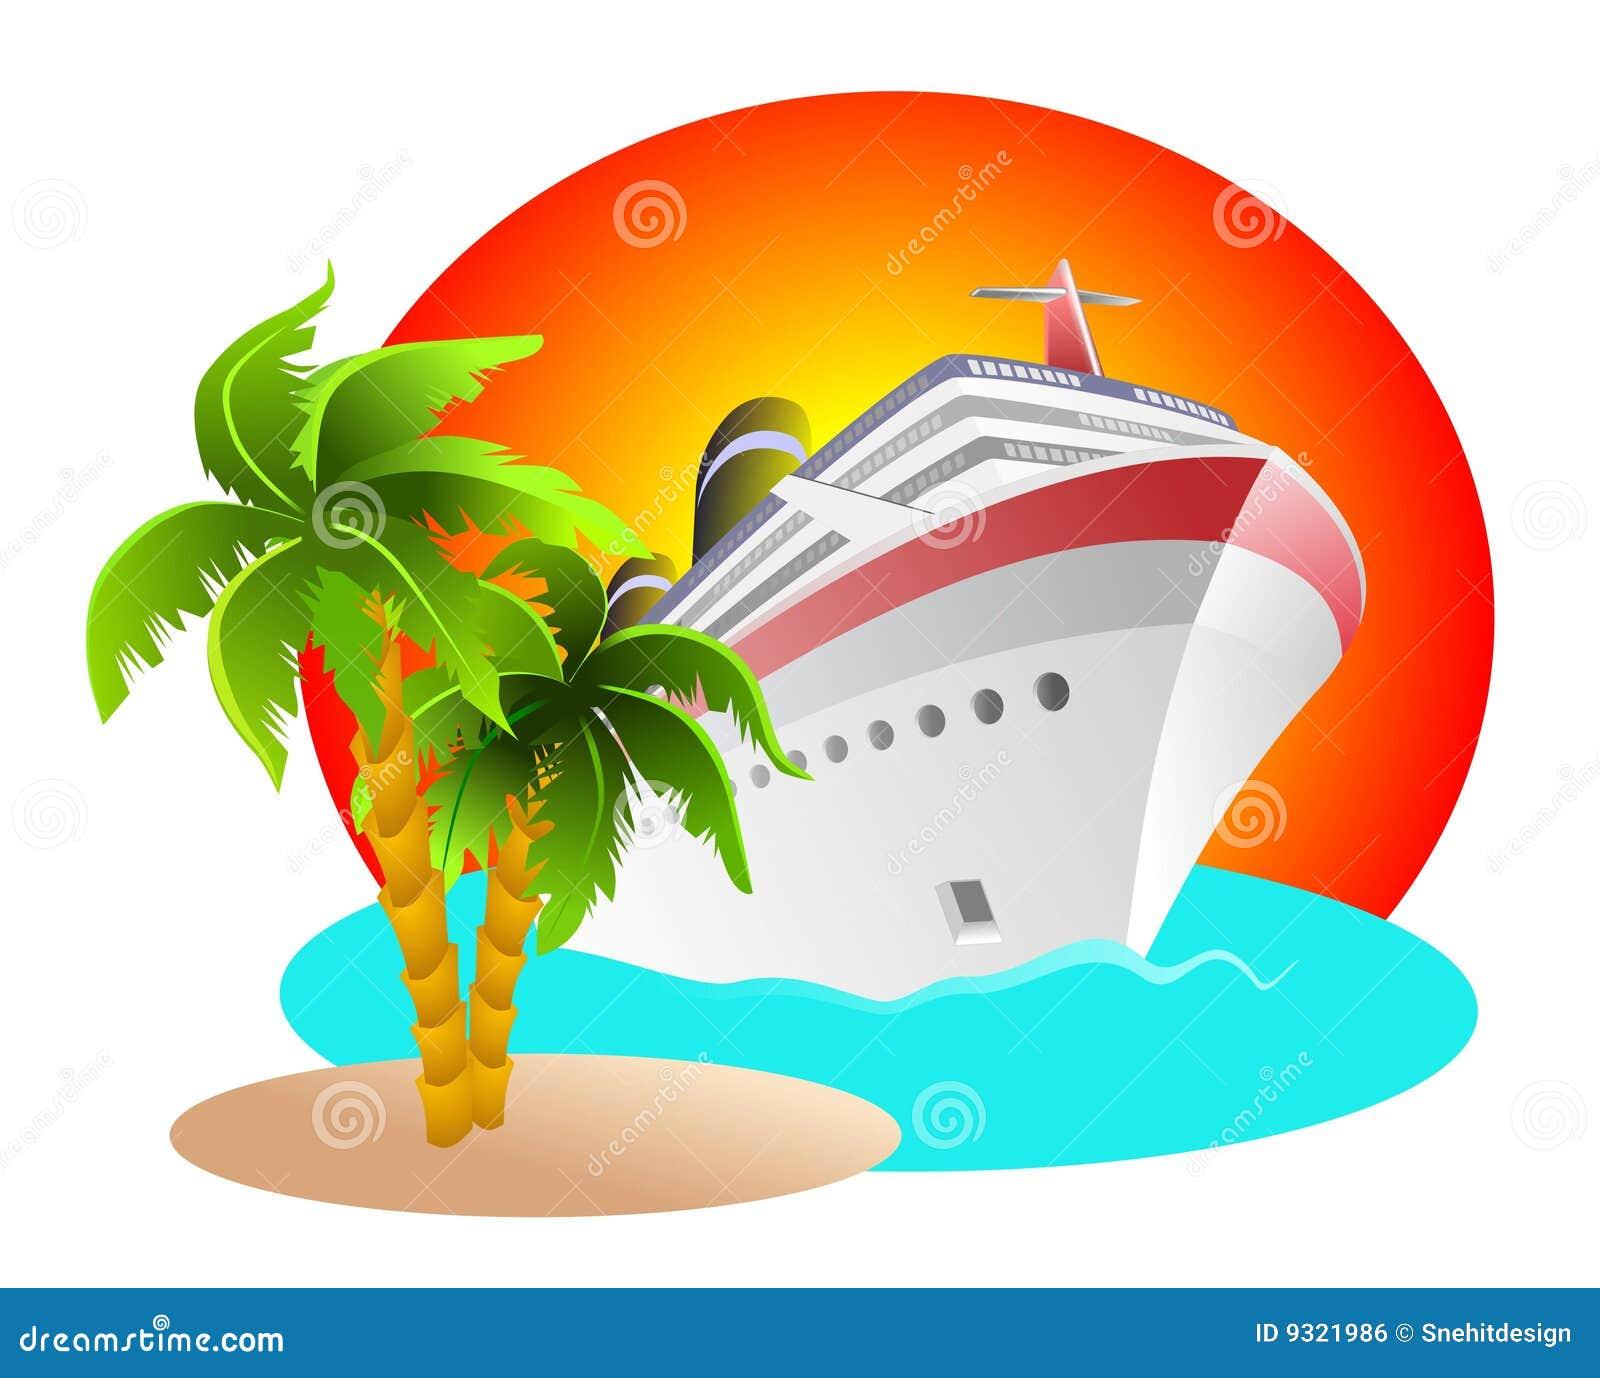 cruise clipart stock illustration illustration of marine 9321986 rh dreamstime com clipart cruise ship free cruise clipart free